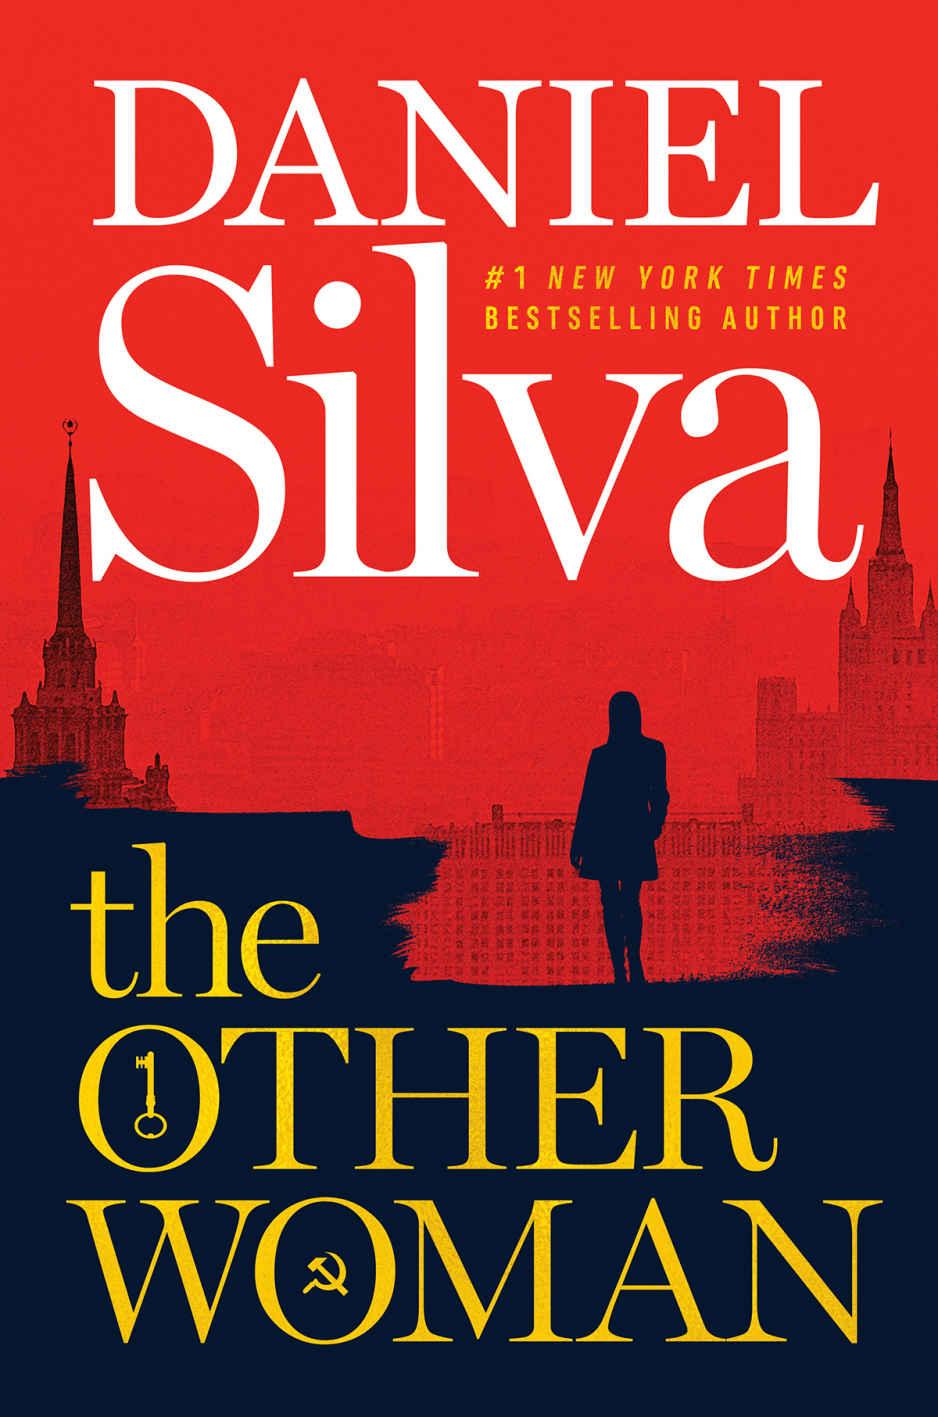 The Other Woman: A Novel - Daniel Silva [kindle] [mobi]